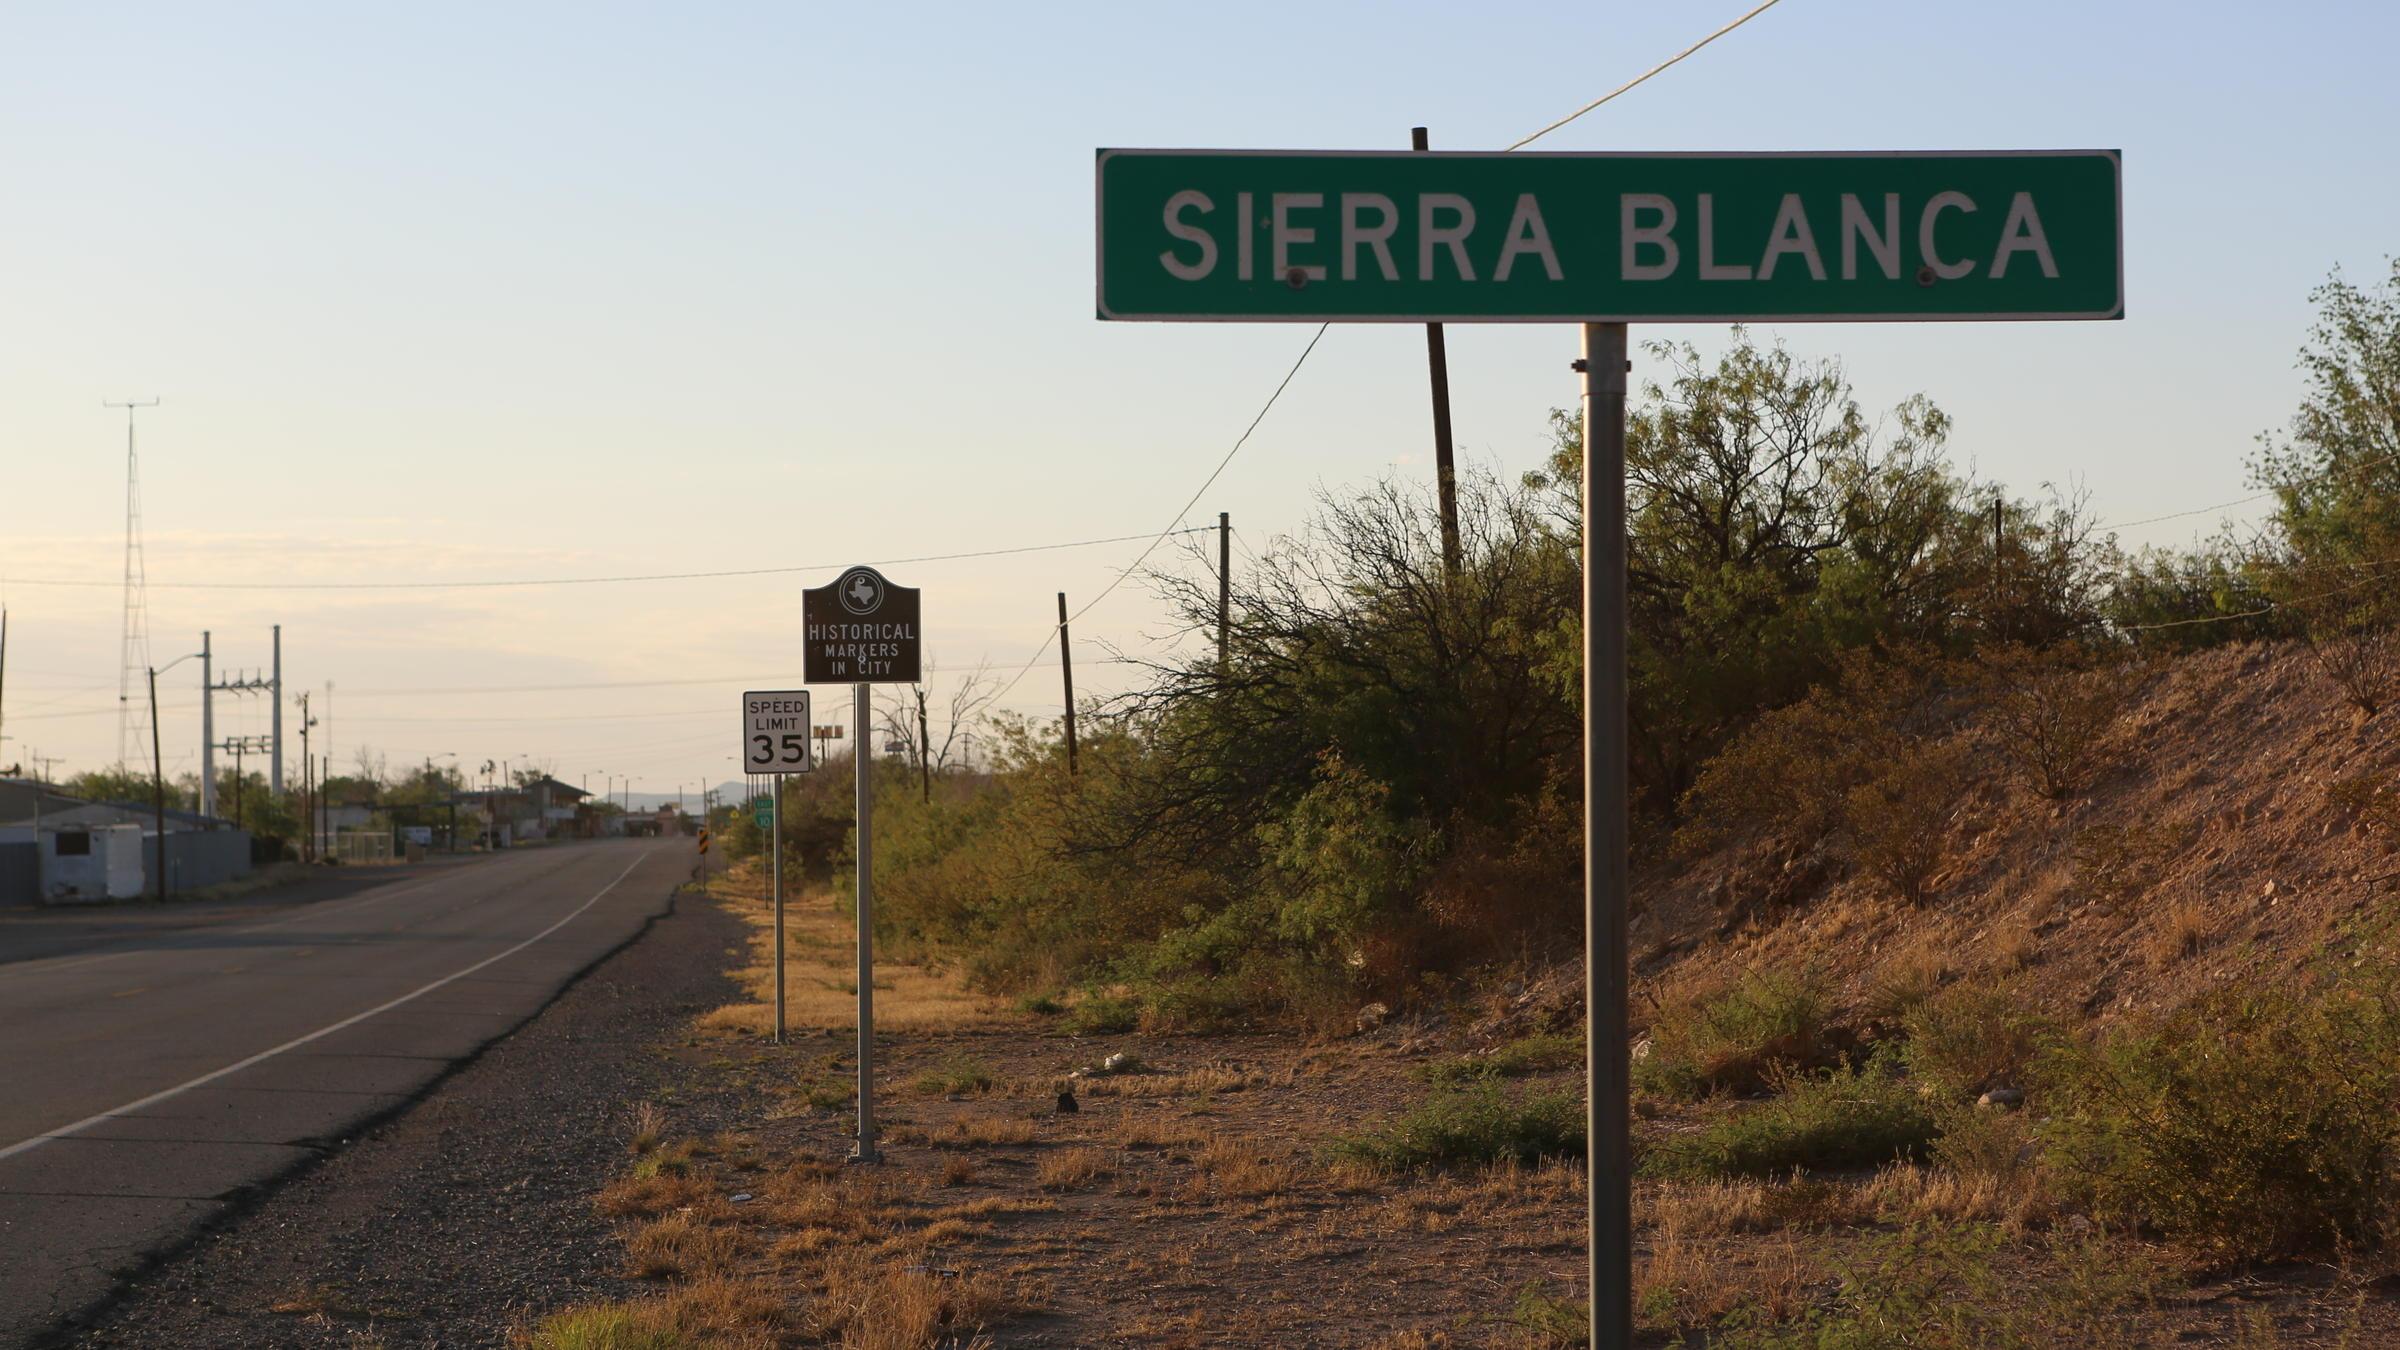 single men in sierra blanca Sierra blanca, tx (texas) houses and residents 55 single-parent households (12 men, 43 women) 400% of residents of sierra blanca speak english at home.